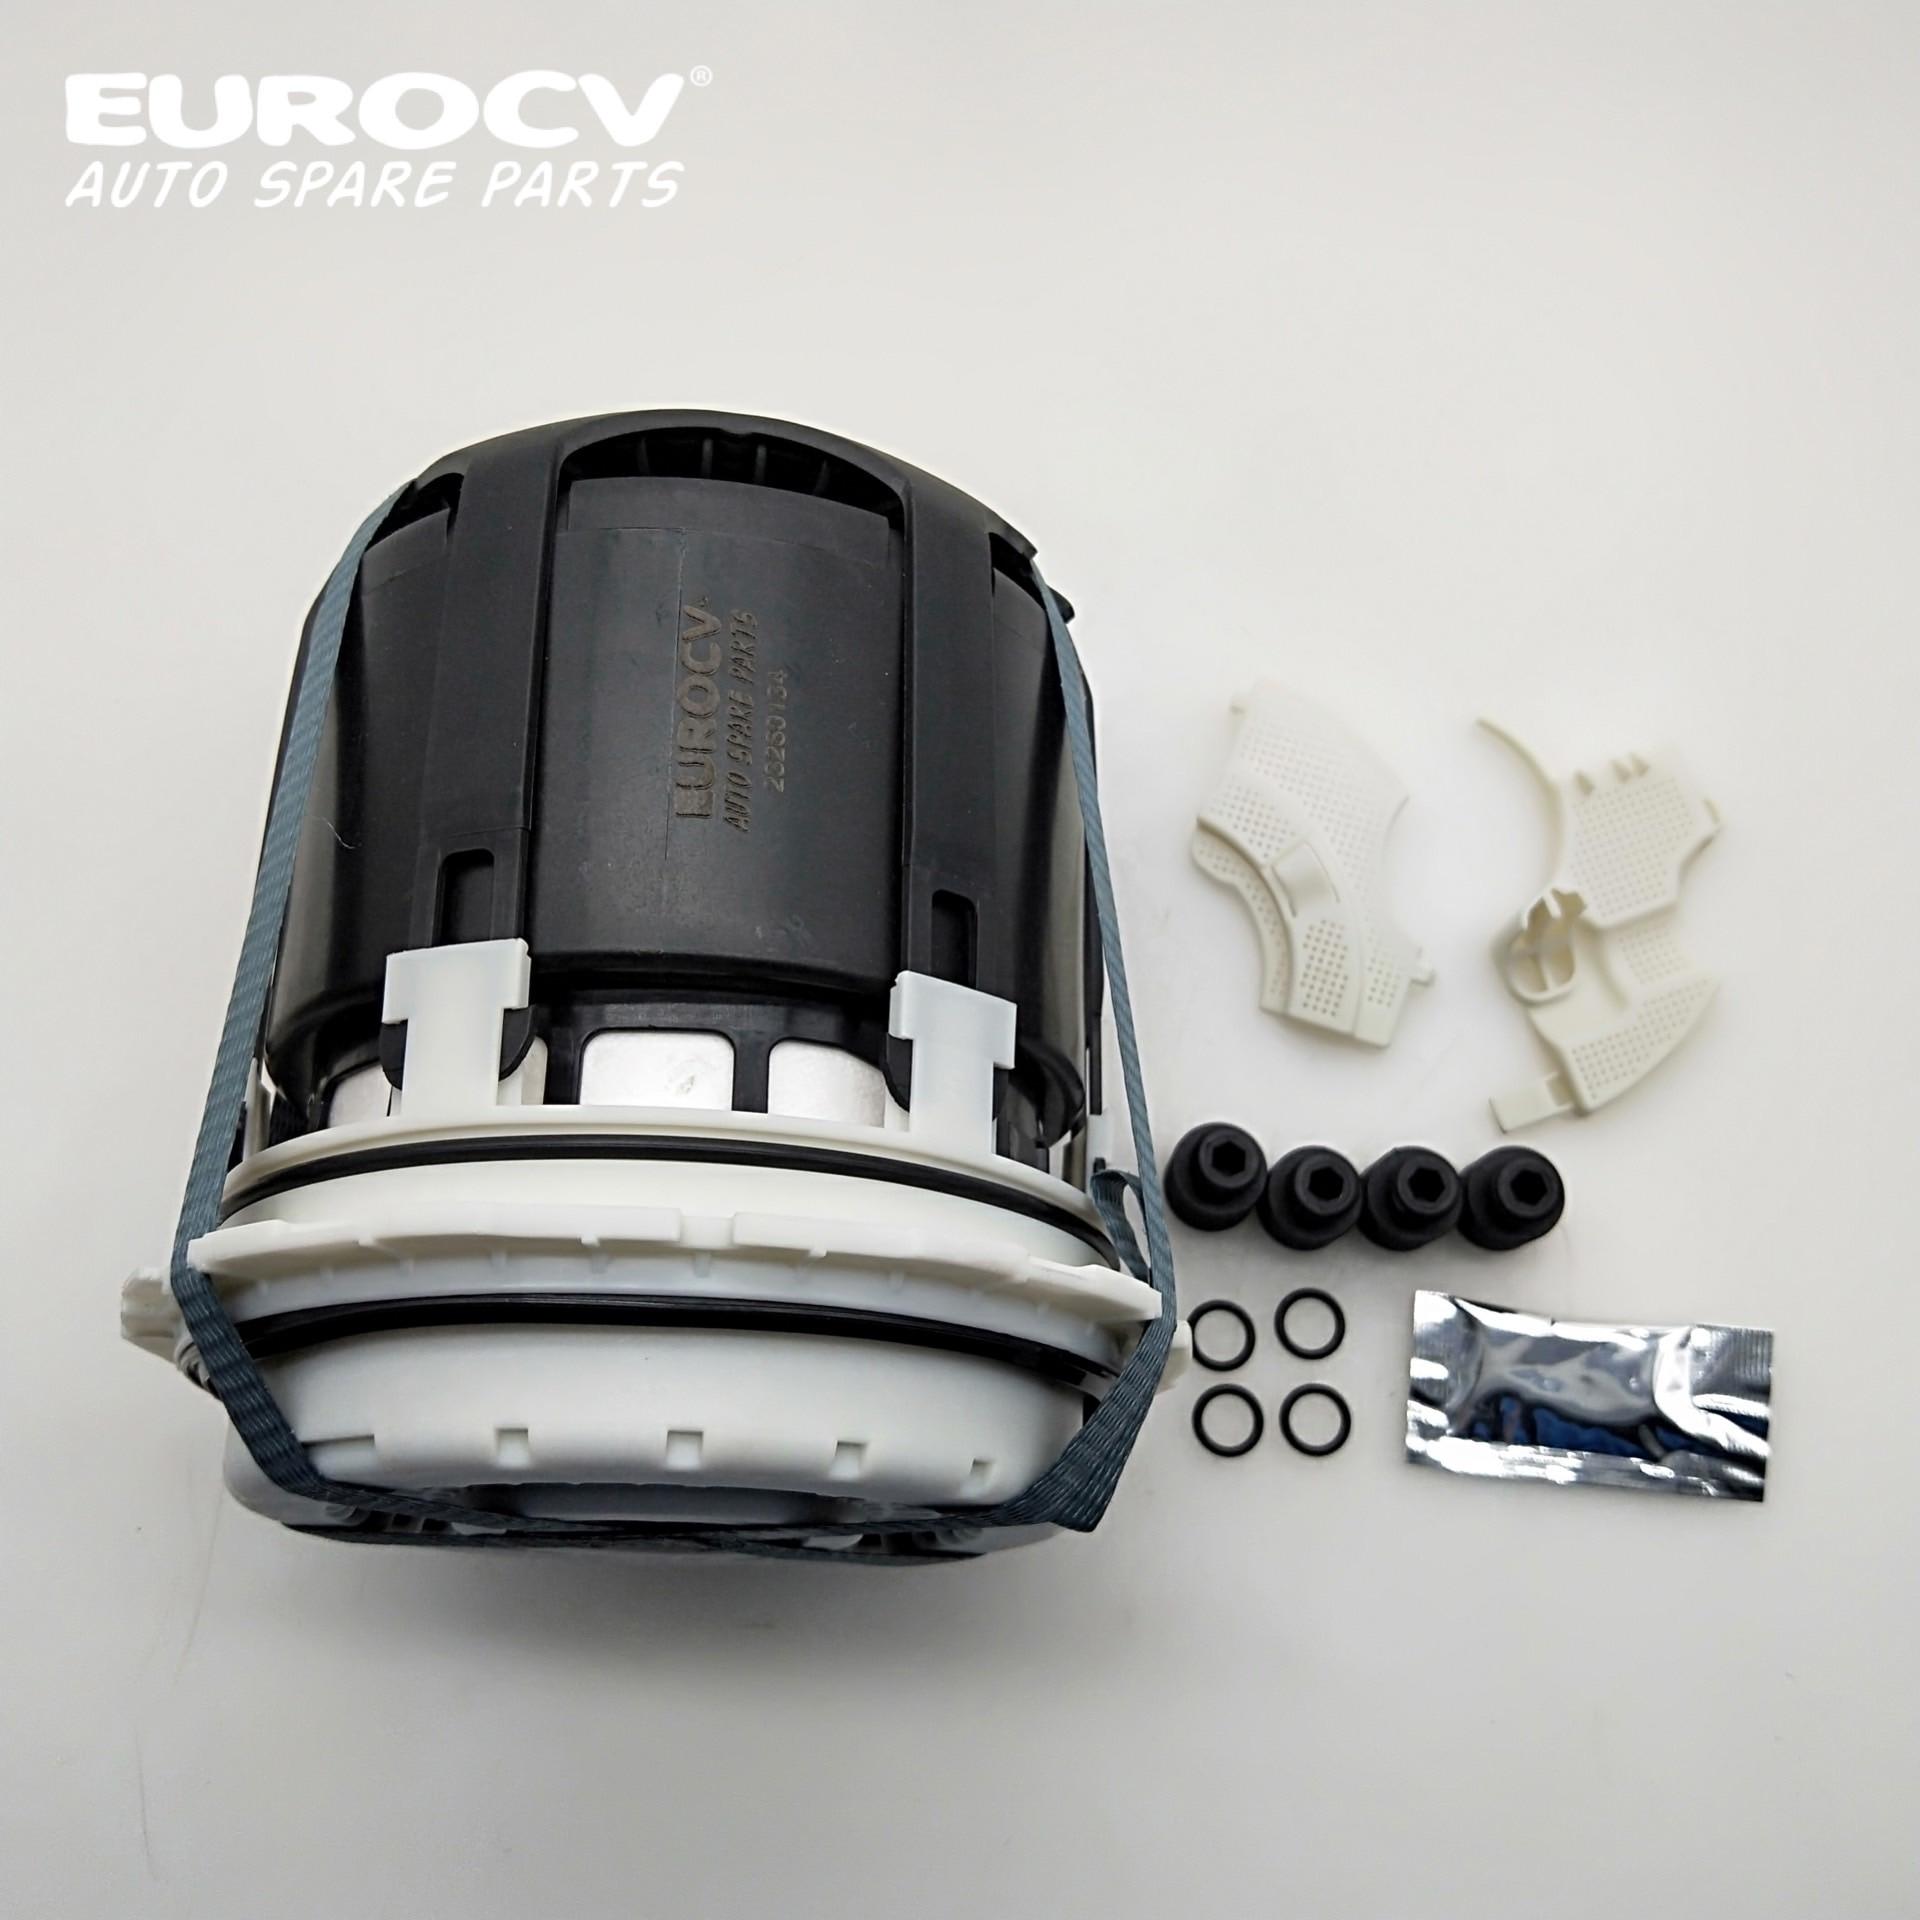 Spare Parts For Volvo Trucks, VOE 2223804, VOE 23260134, Air Dryer Cartridge